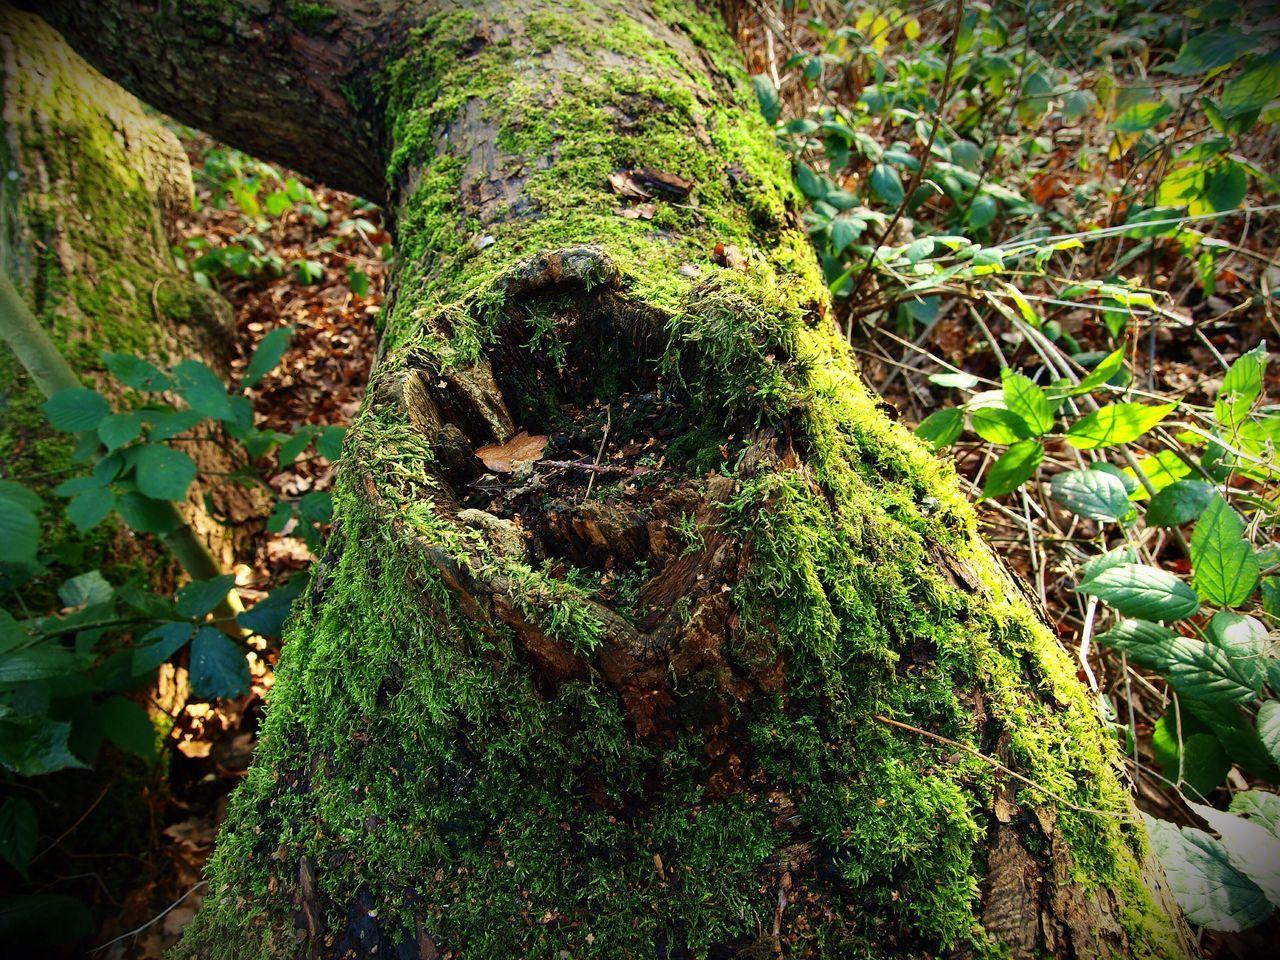 Moss. Nature Forest Green Color Tree Trunk Steve Merrick London Zuiko Stevesevilempire Olympus Hampstead Heath